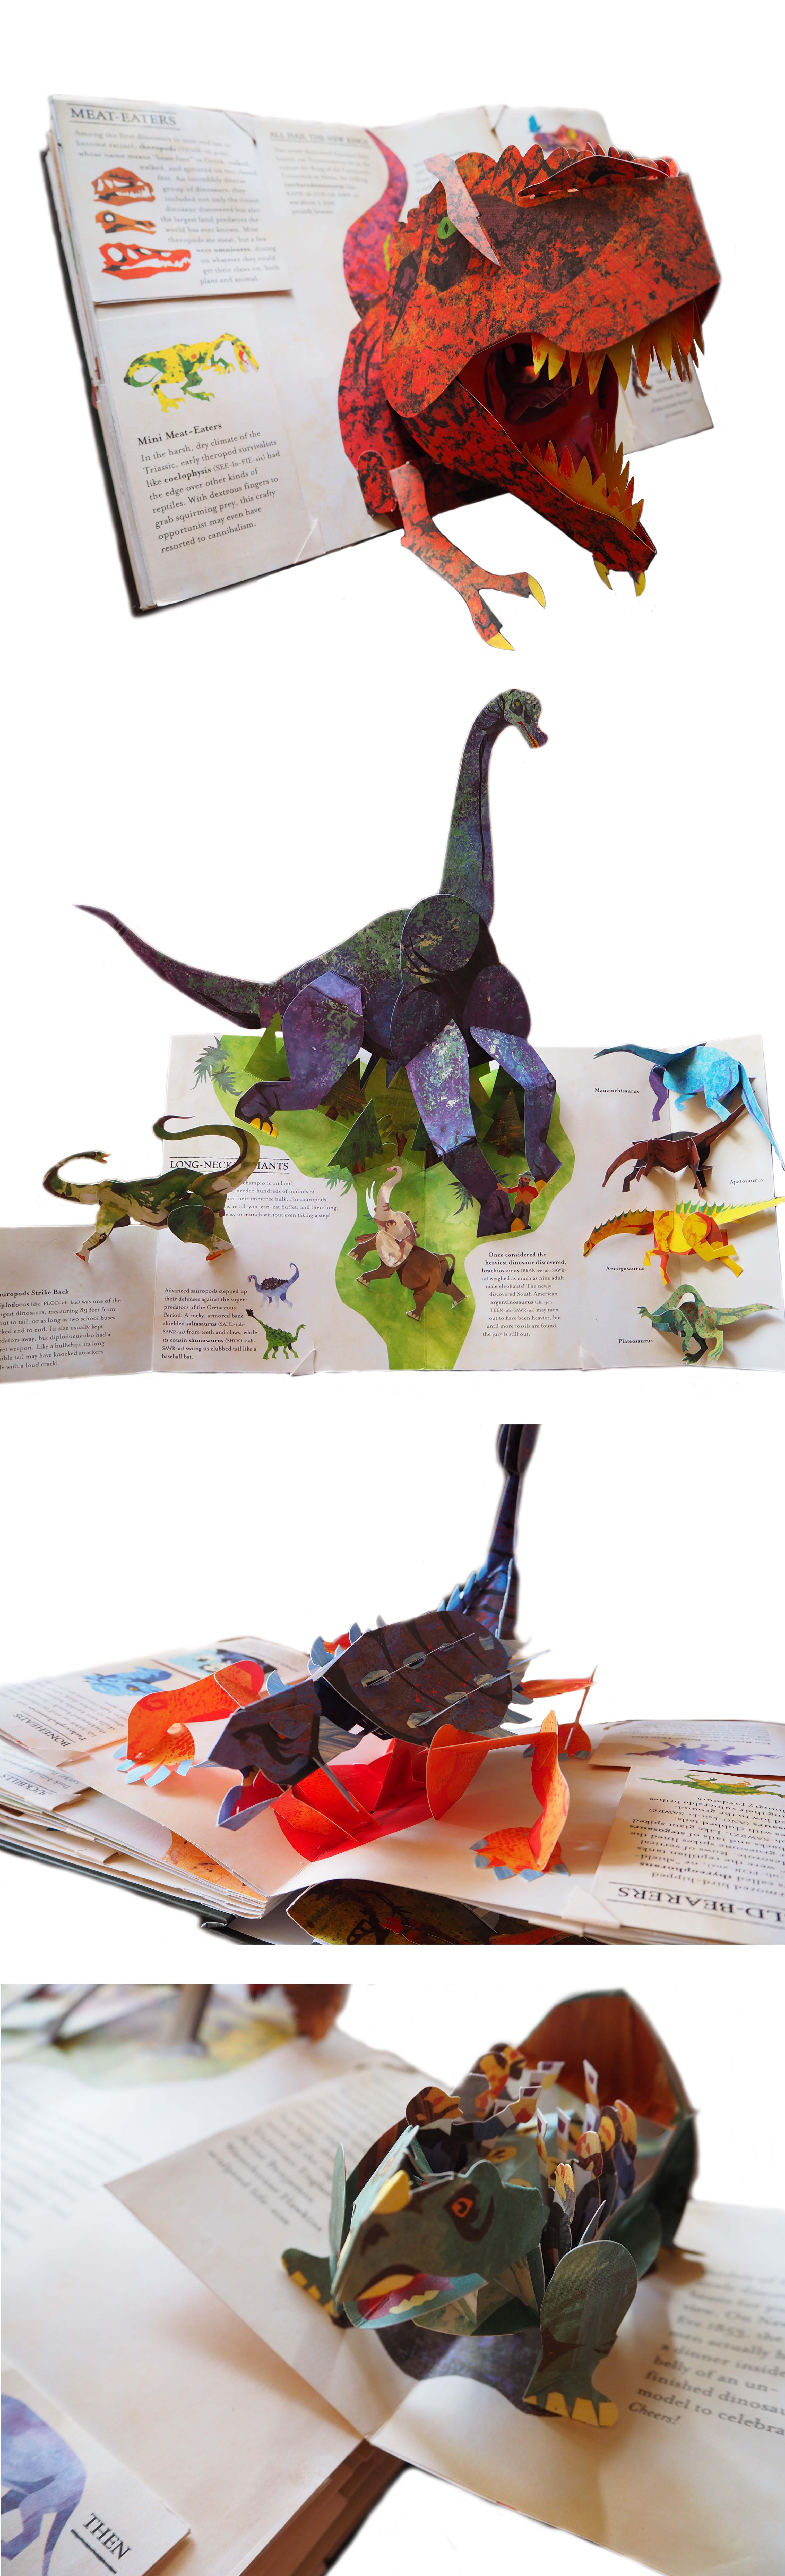 Encyclopedia Prehistorica Dinosaurs, Robert Sabuda &Matthew Reinhart Amazing pop-up book